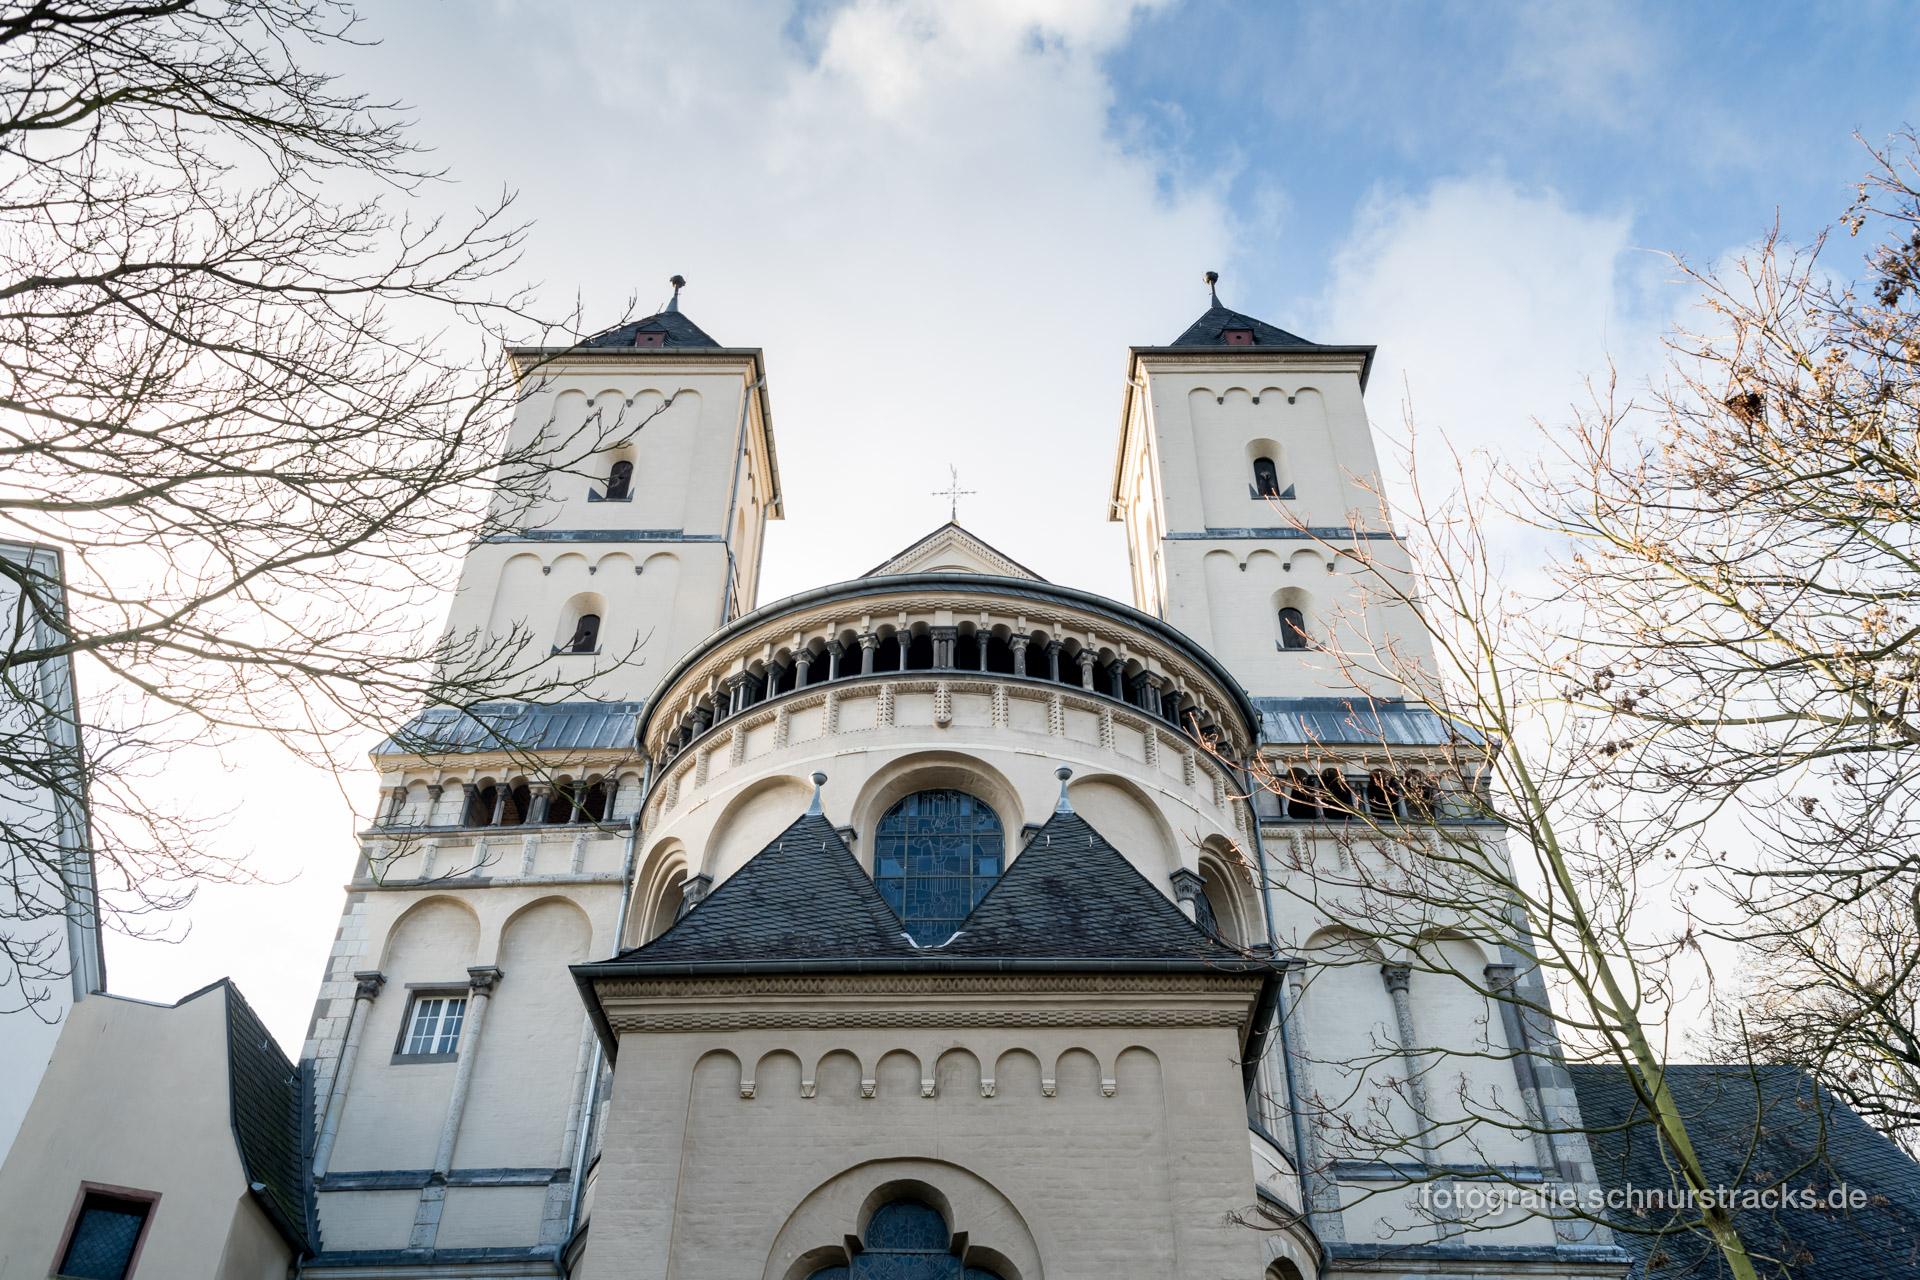 Ostfassade Abteikirche Brauweiler #0195